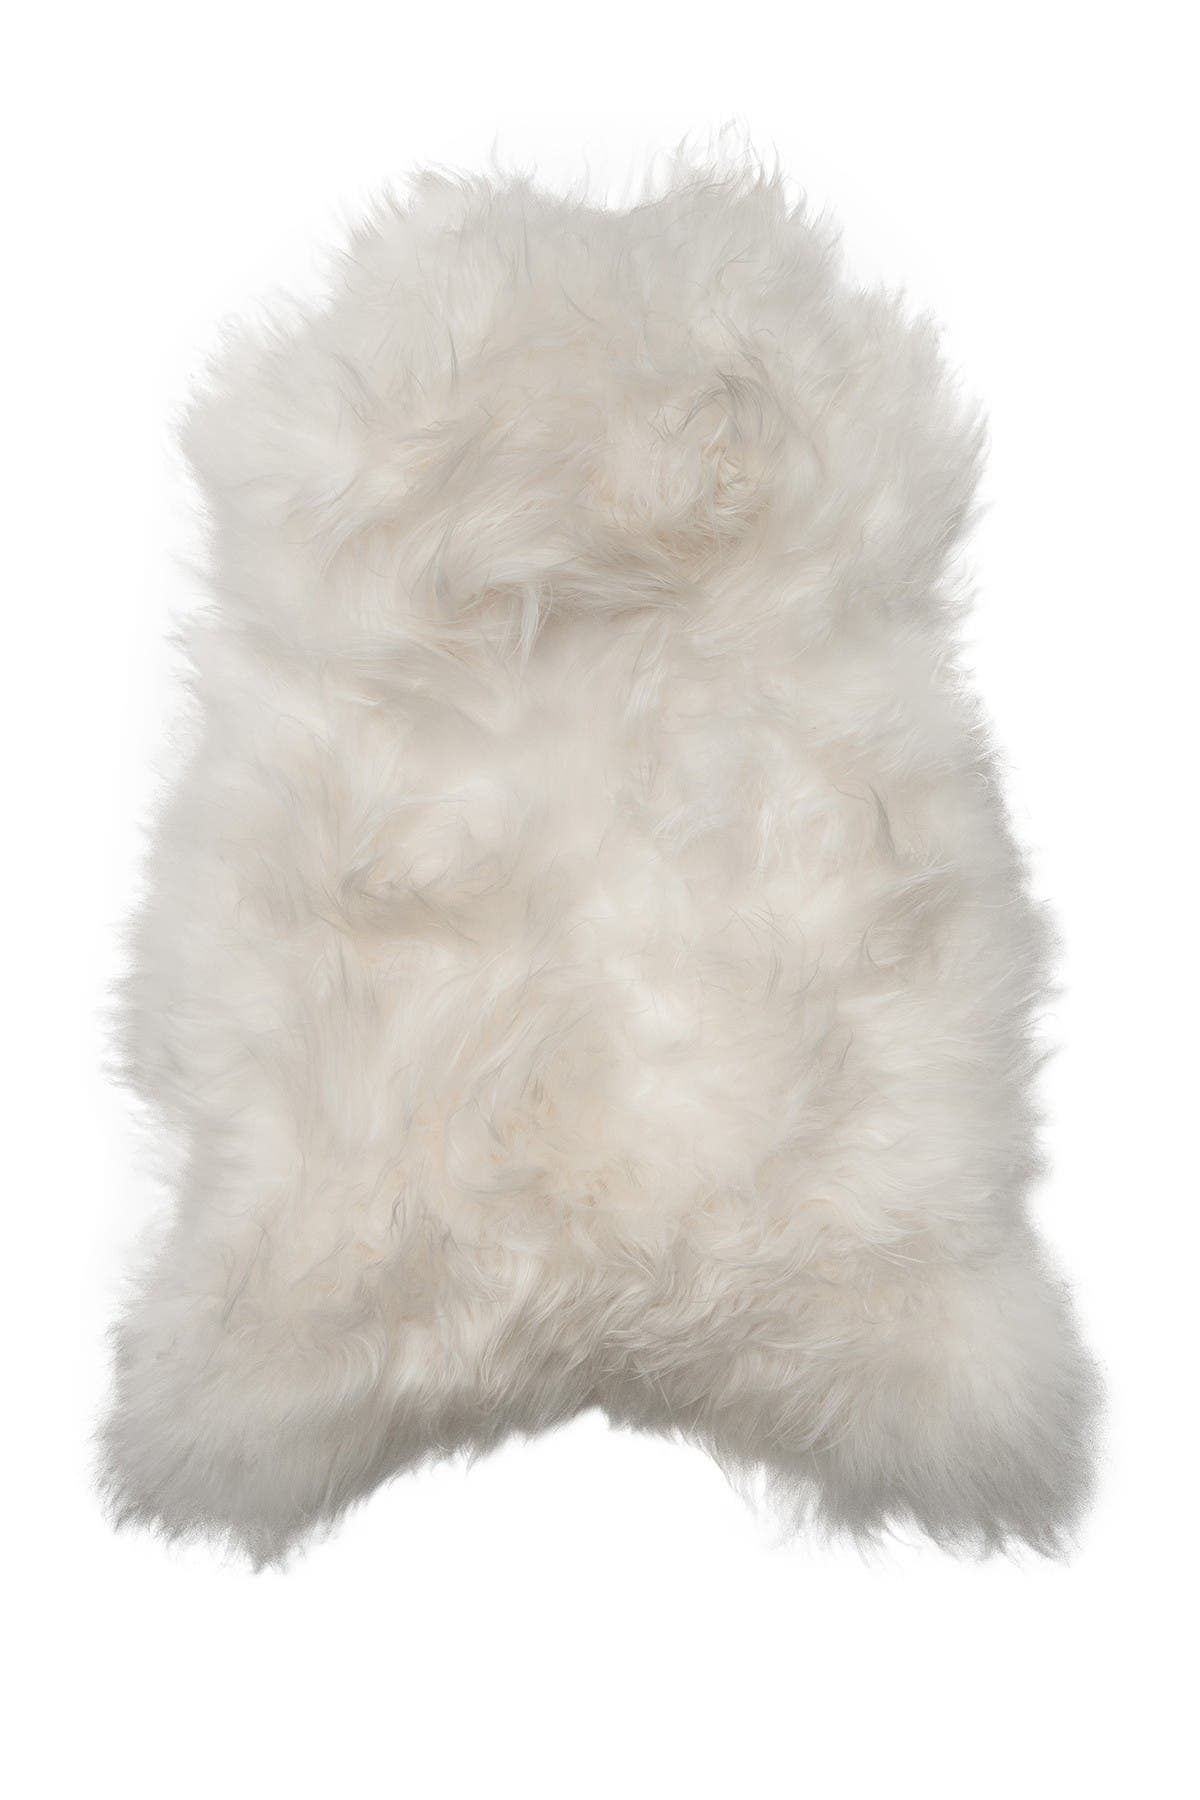 Image of Natural Genuine Icelandic Sheepskin Single Long-Haired Rug - 2ft x 3ft - White